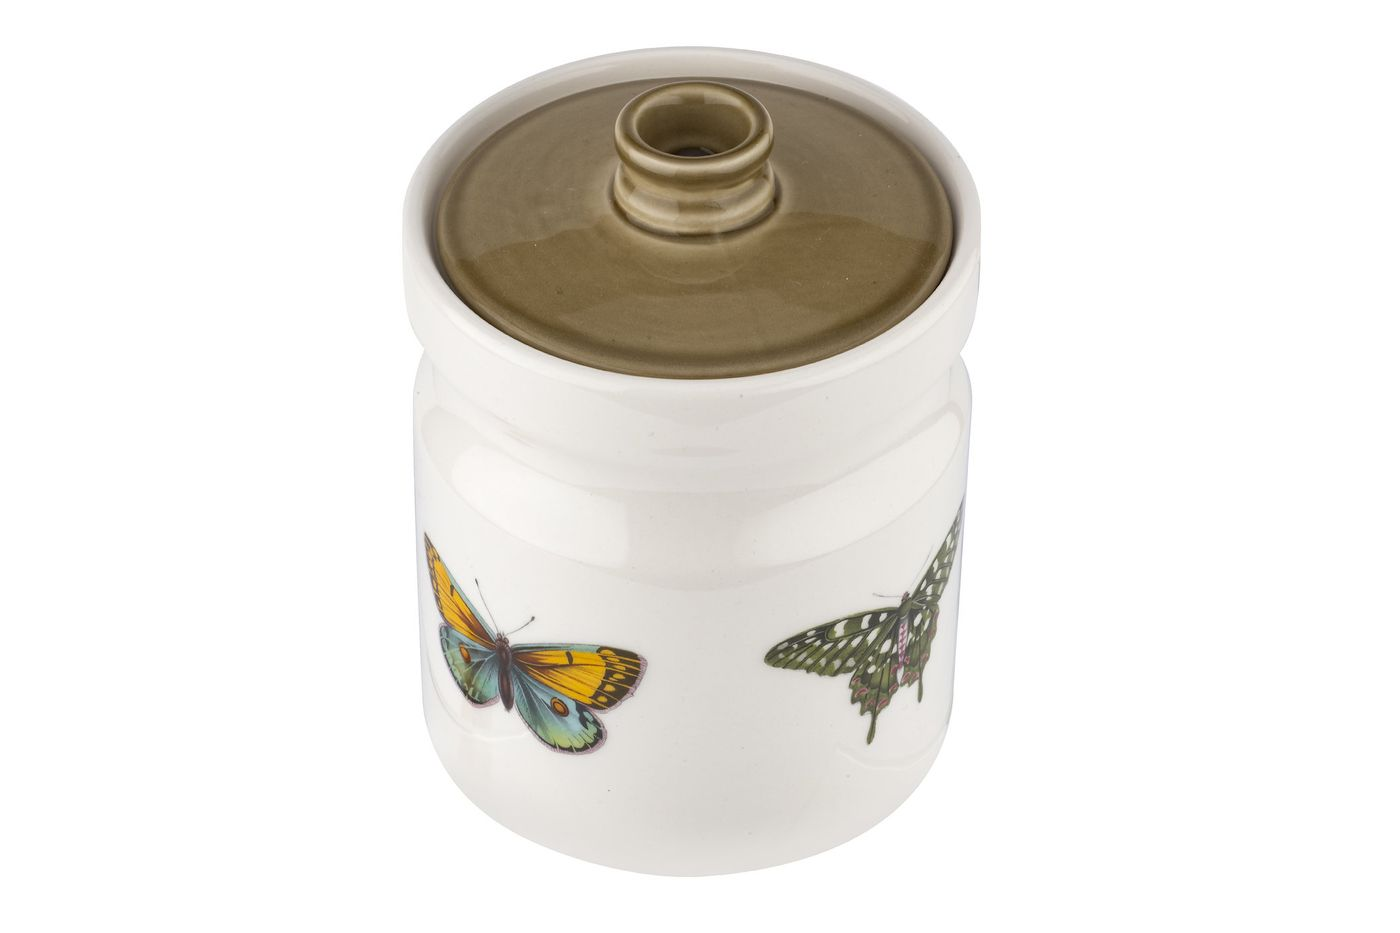 Portmeirion Botanic Garden Harmony Storage Jar + Lid 14cm thumb 2